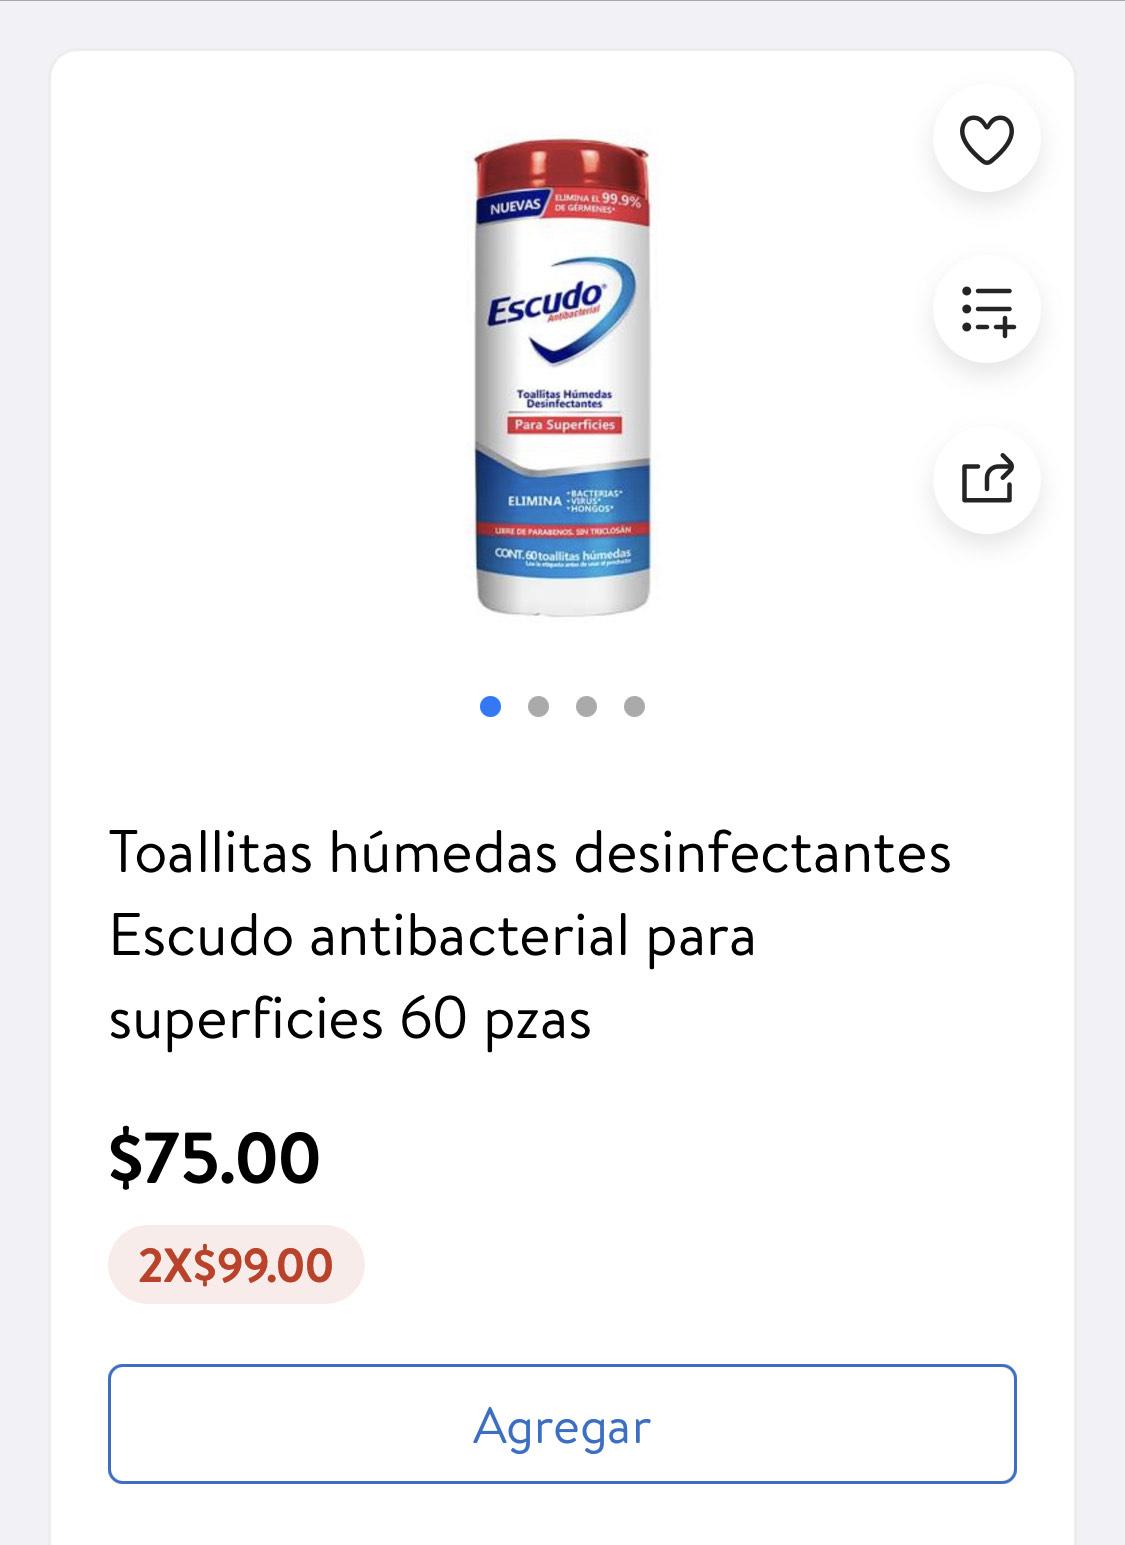 Walmart Toallitas húmedas desinfectantes Escudo antibacterial para superficies 60 pzas